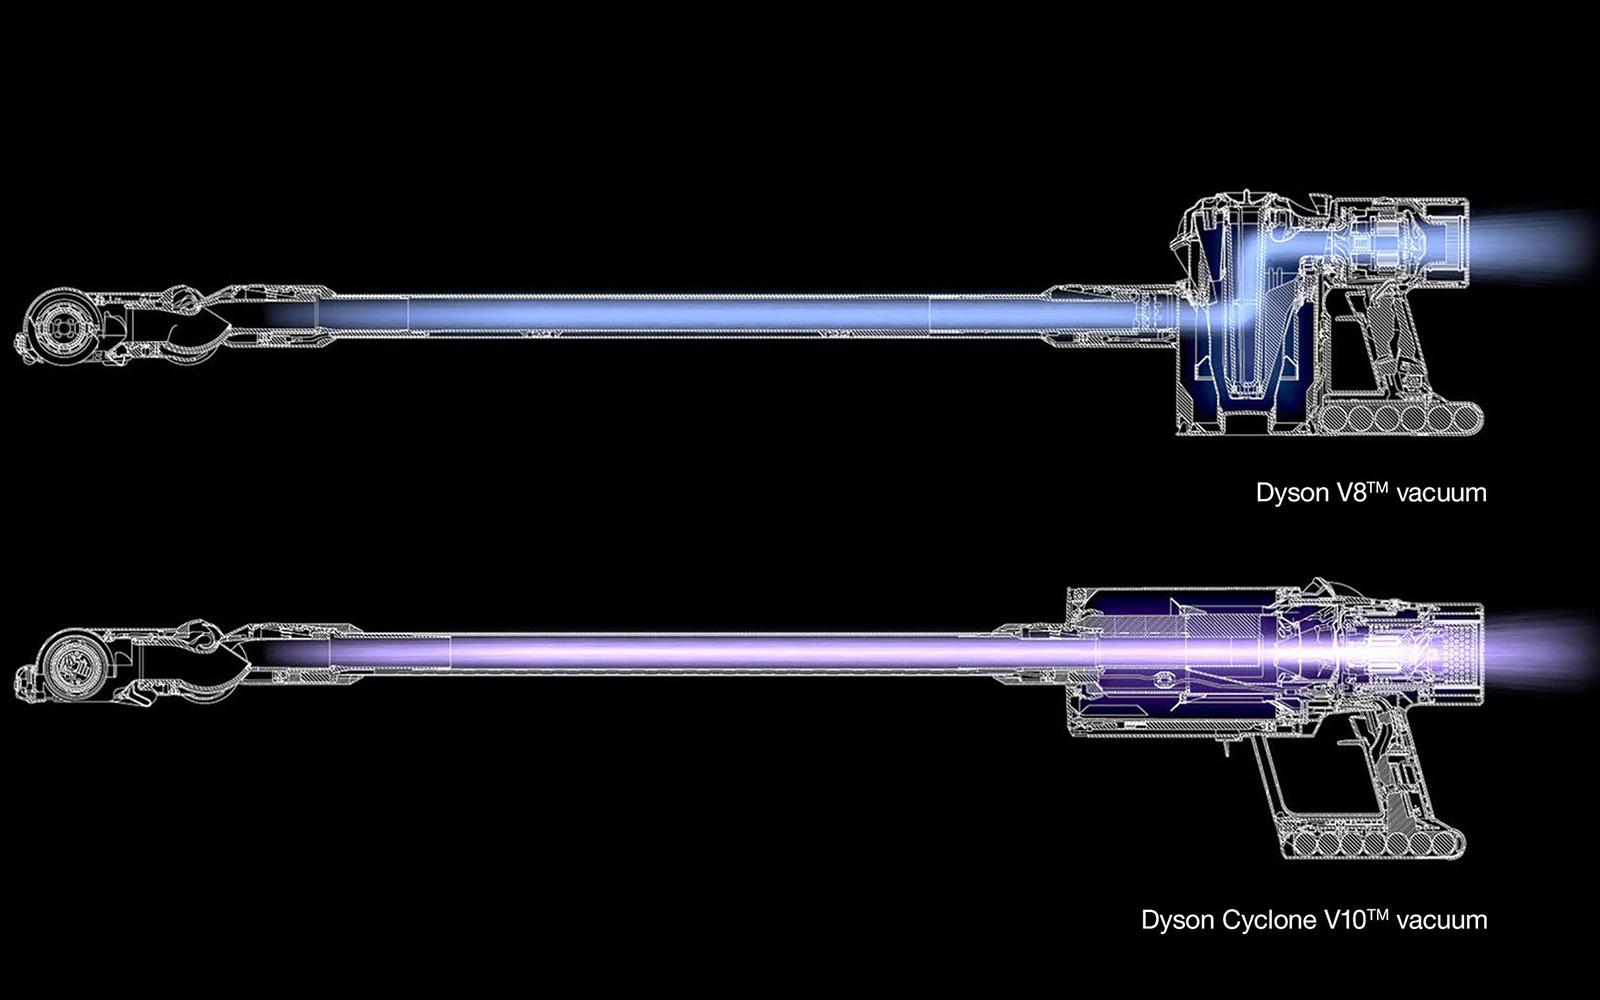 Solved] Dyson V8 vs V10 Comparison